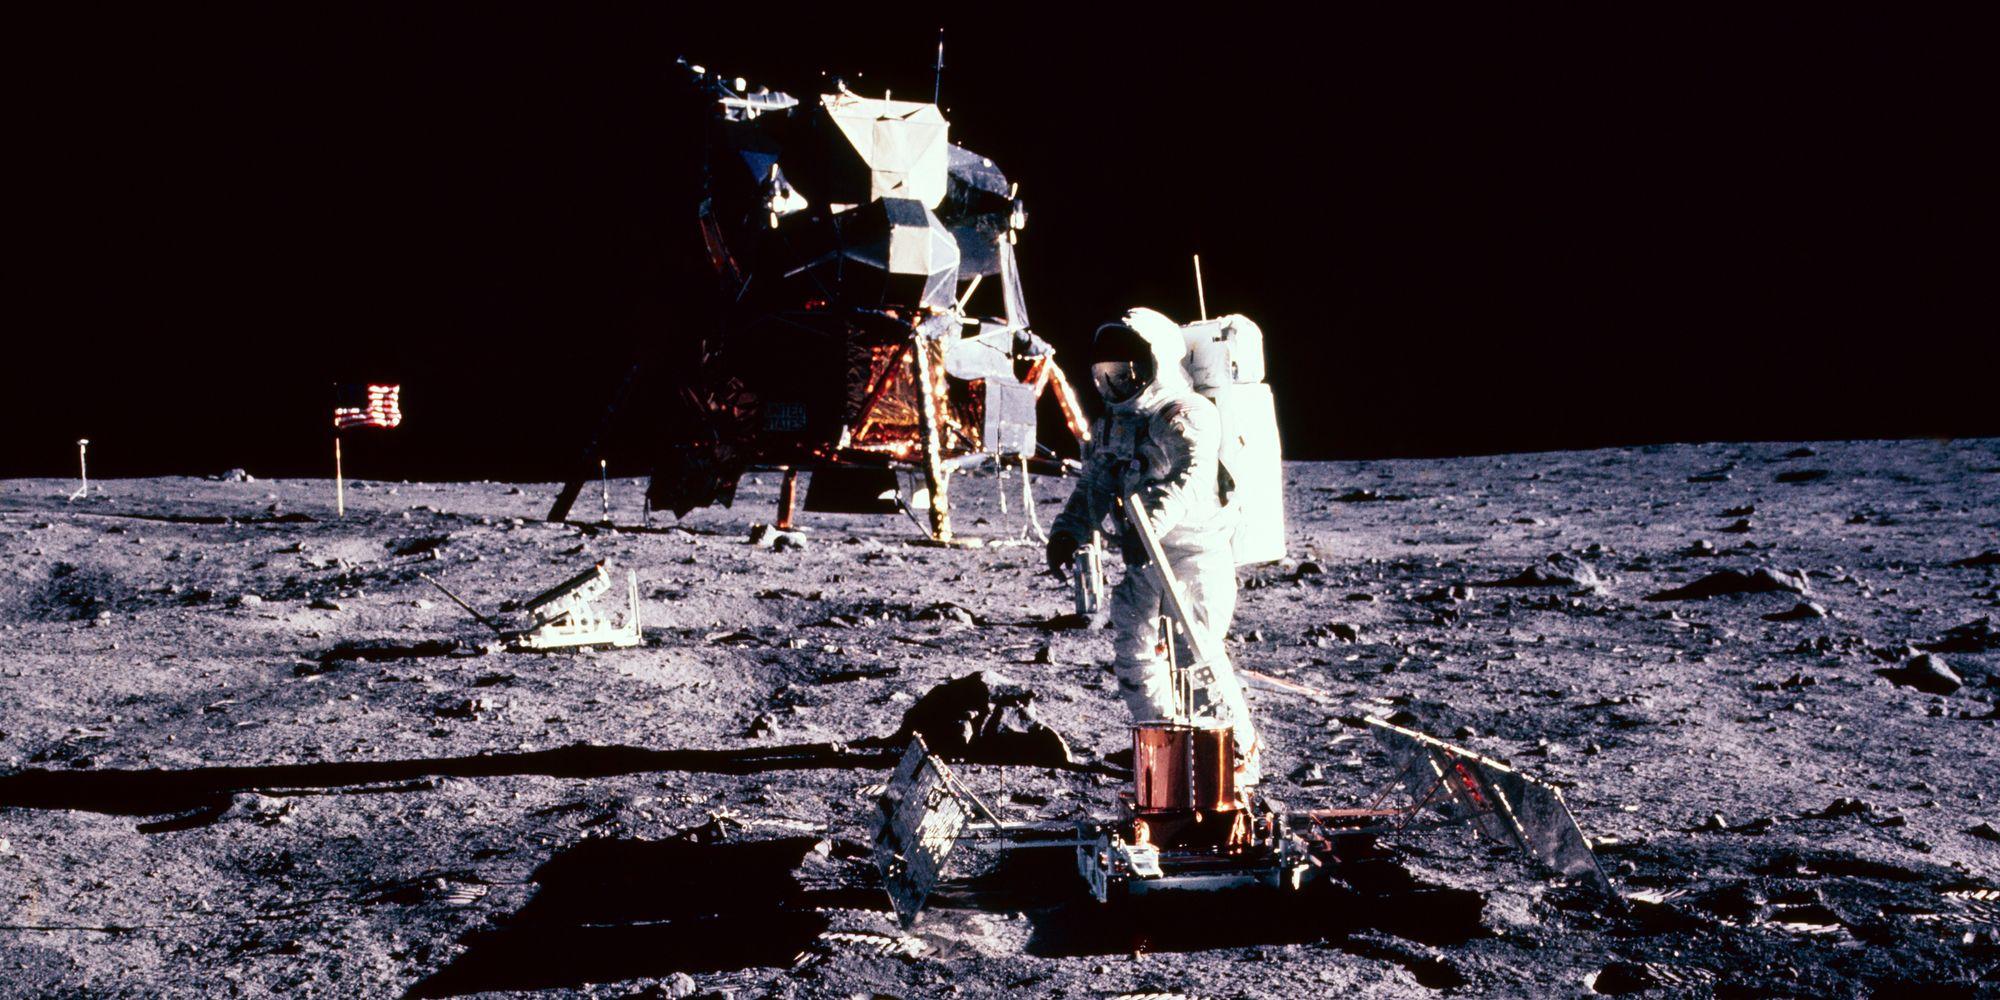 apollo space program documentary - photo #2